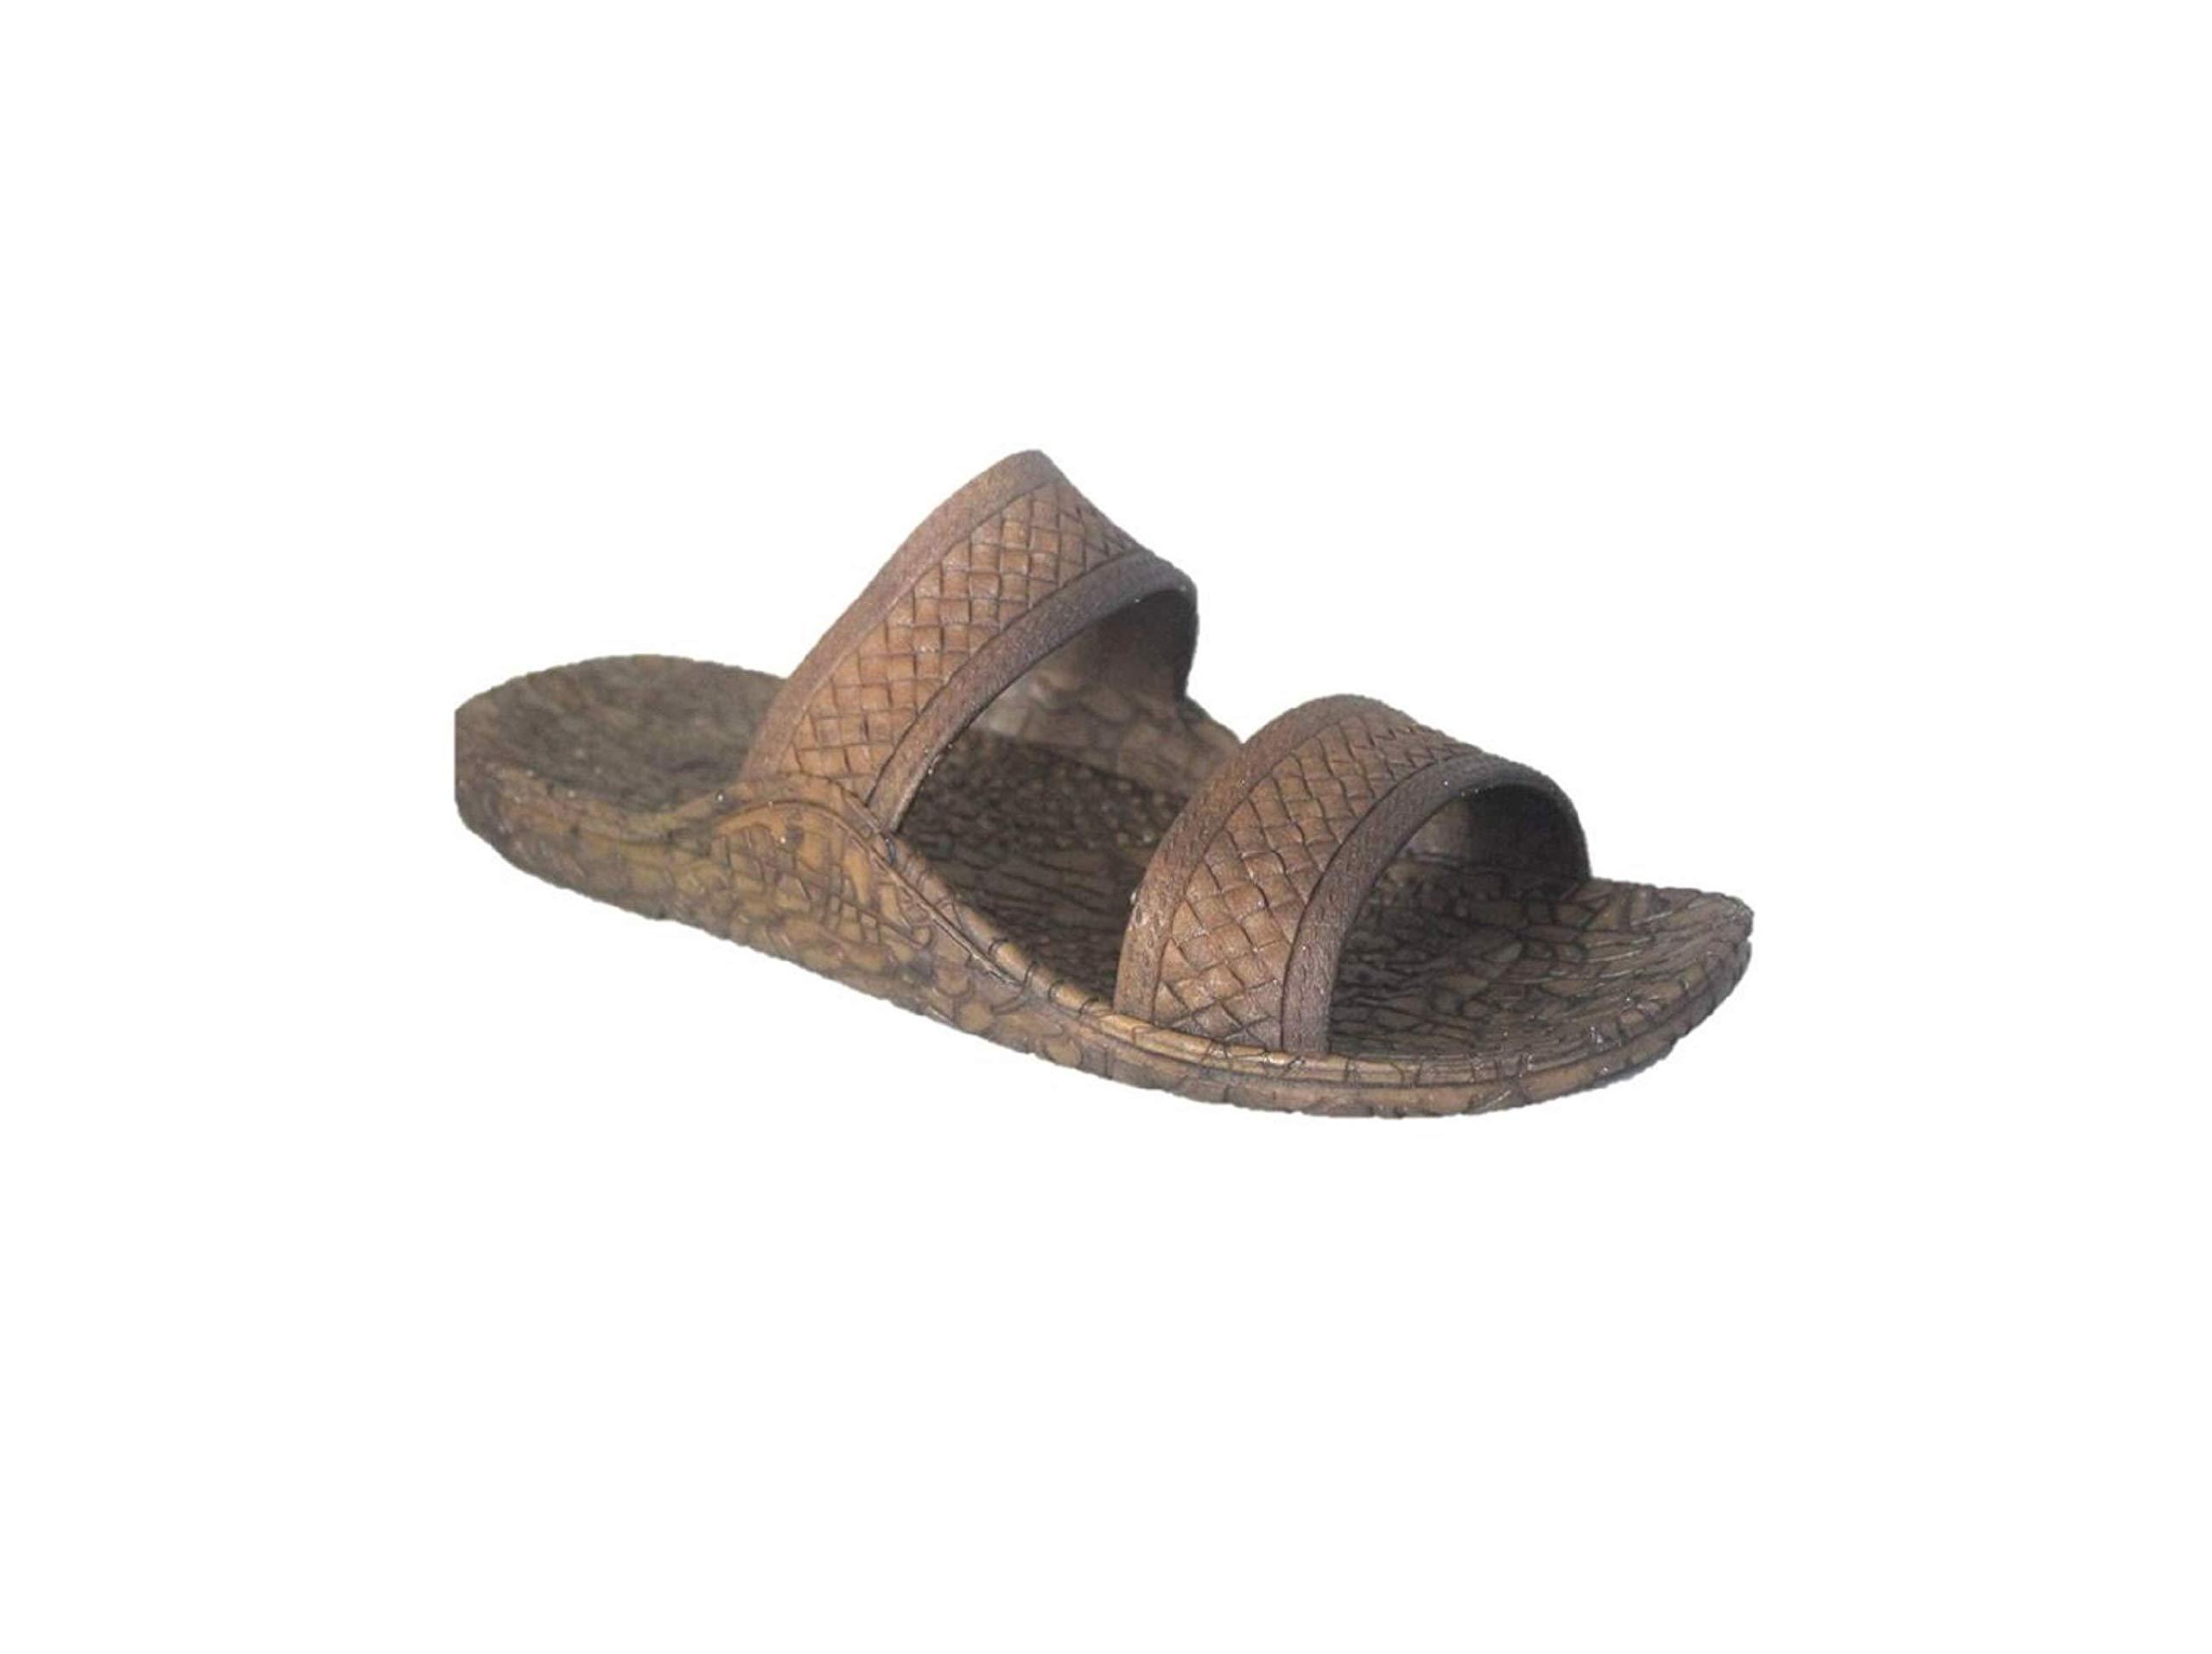 Kids J-Slips Hawaiian Jesus Sandals in 4 Cool Colors /& 20 US Sizes Toddlers Womens Big Mens